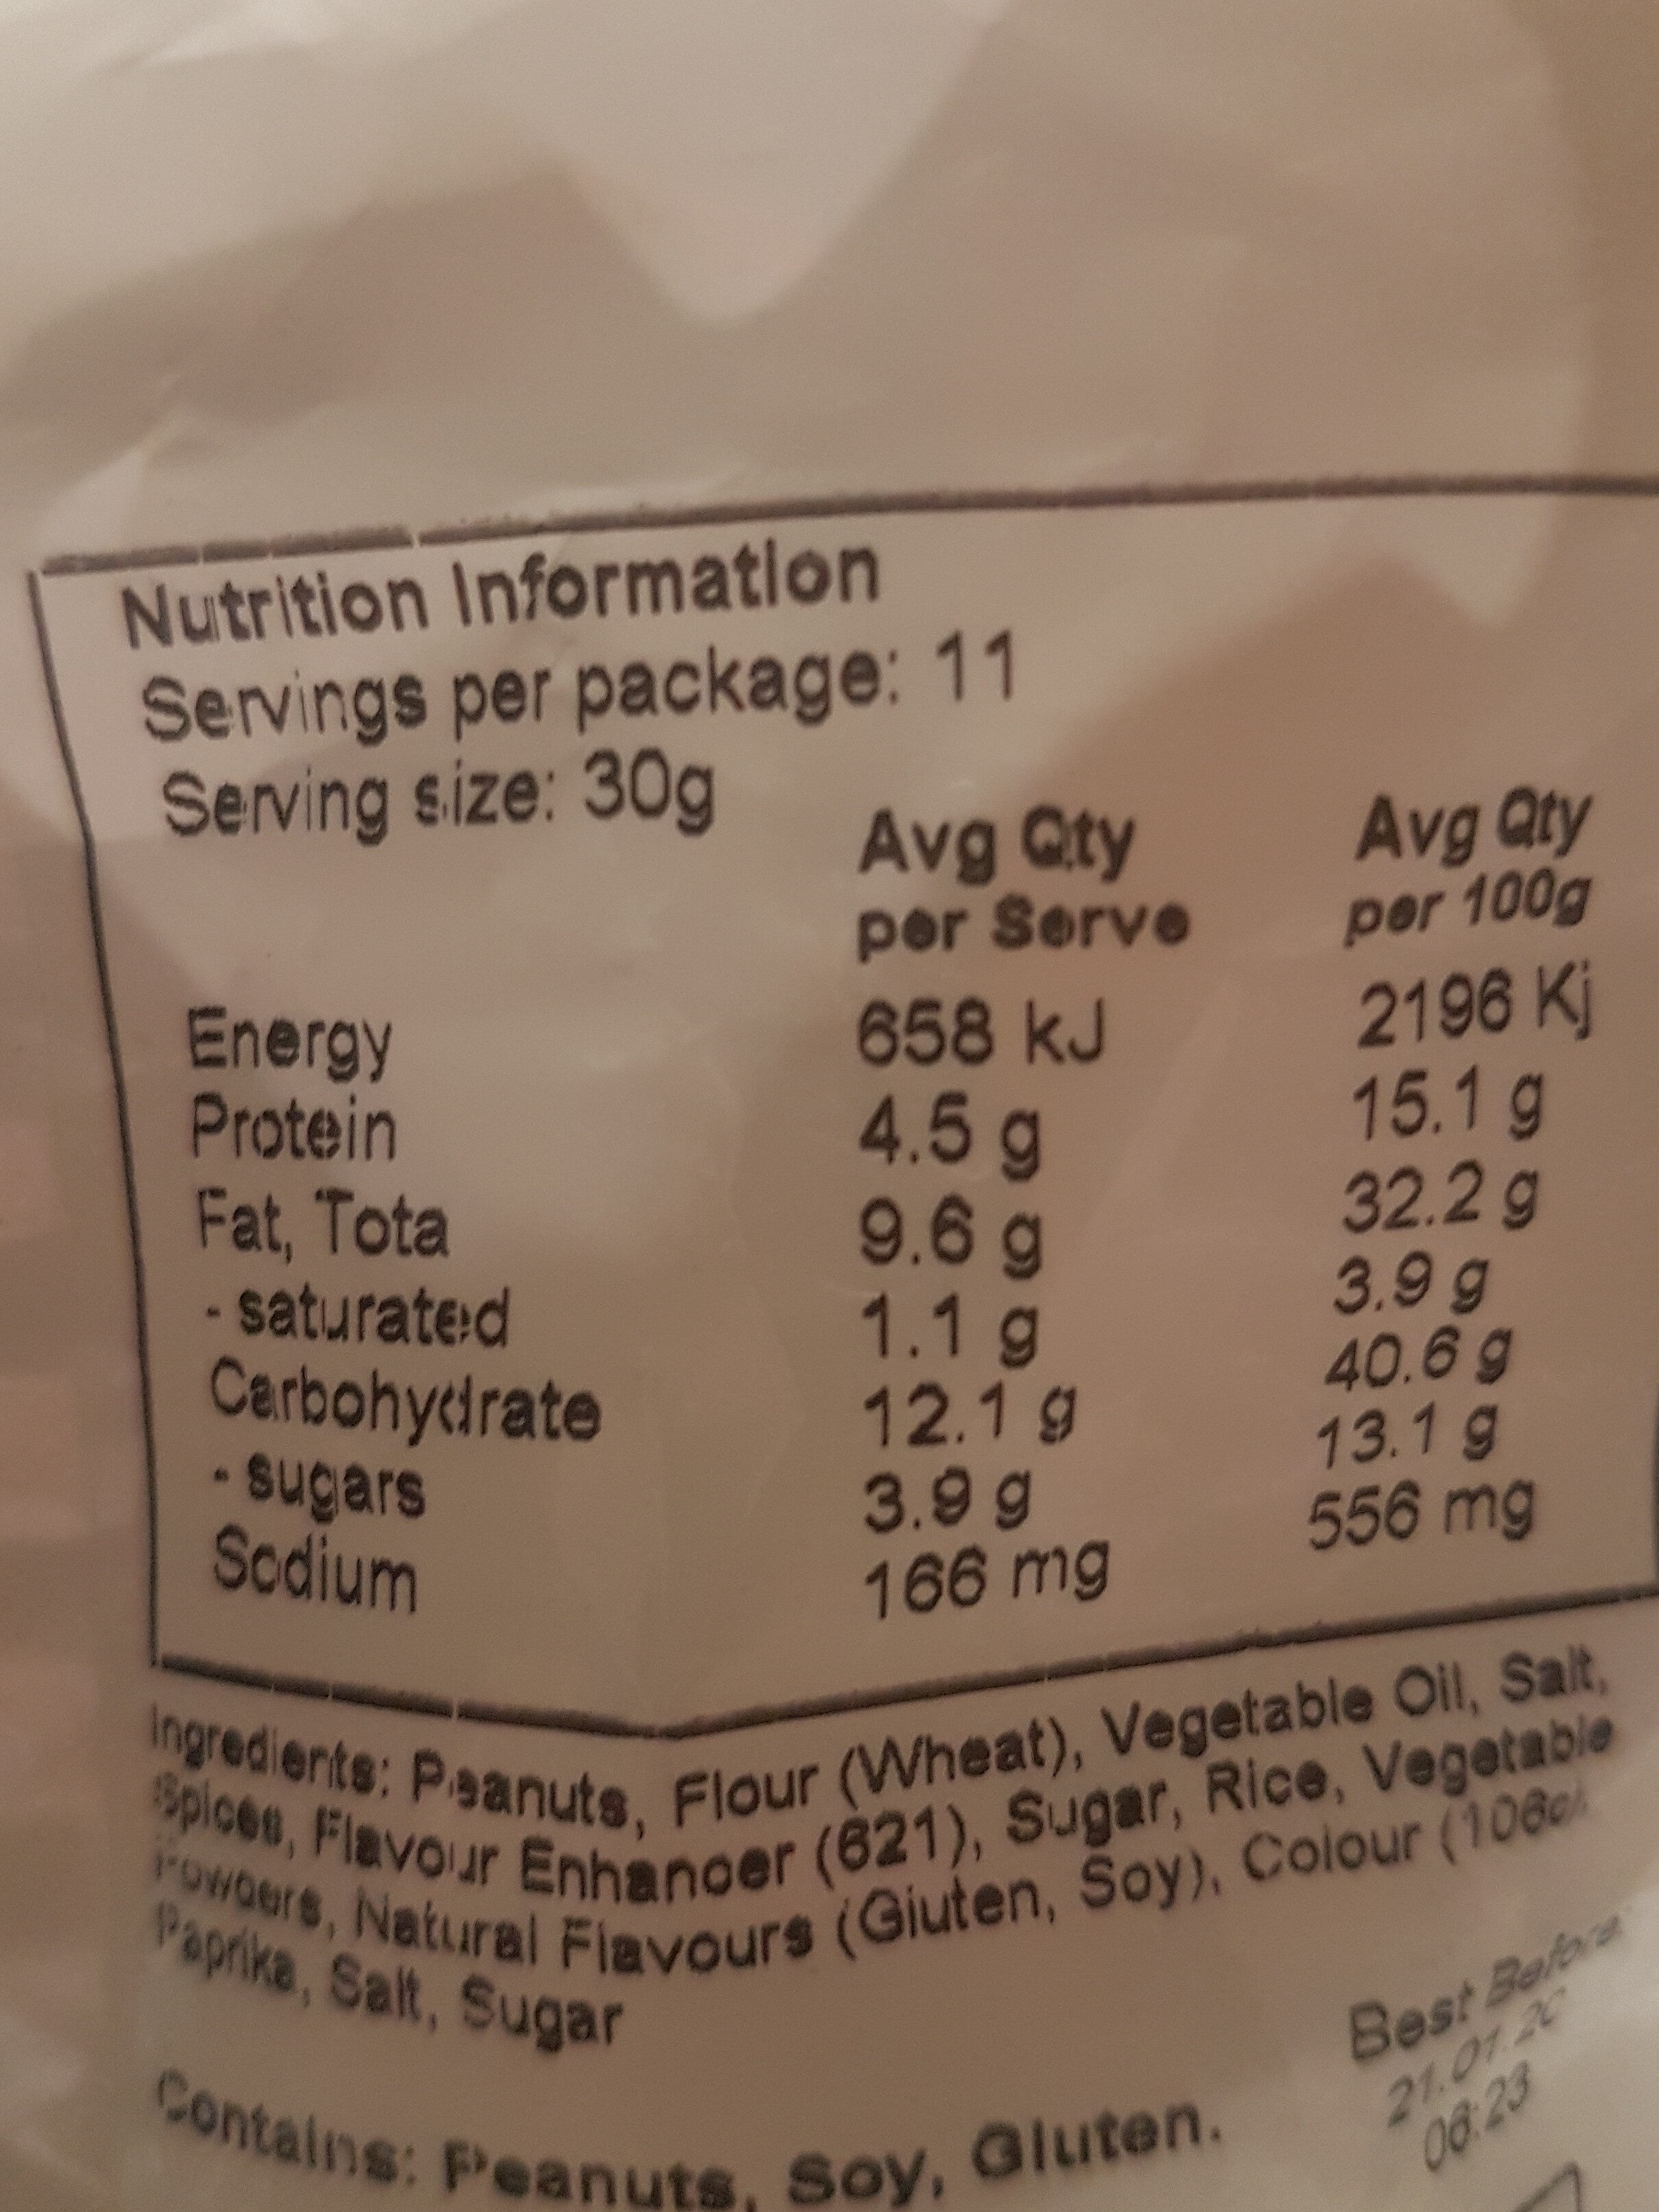 barbecue kri kri peanuts - Nutrition facts - en